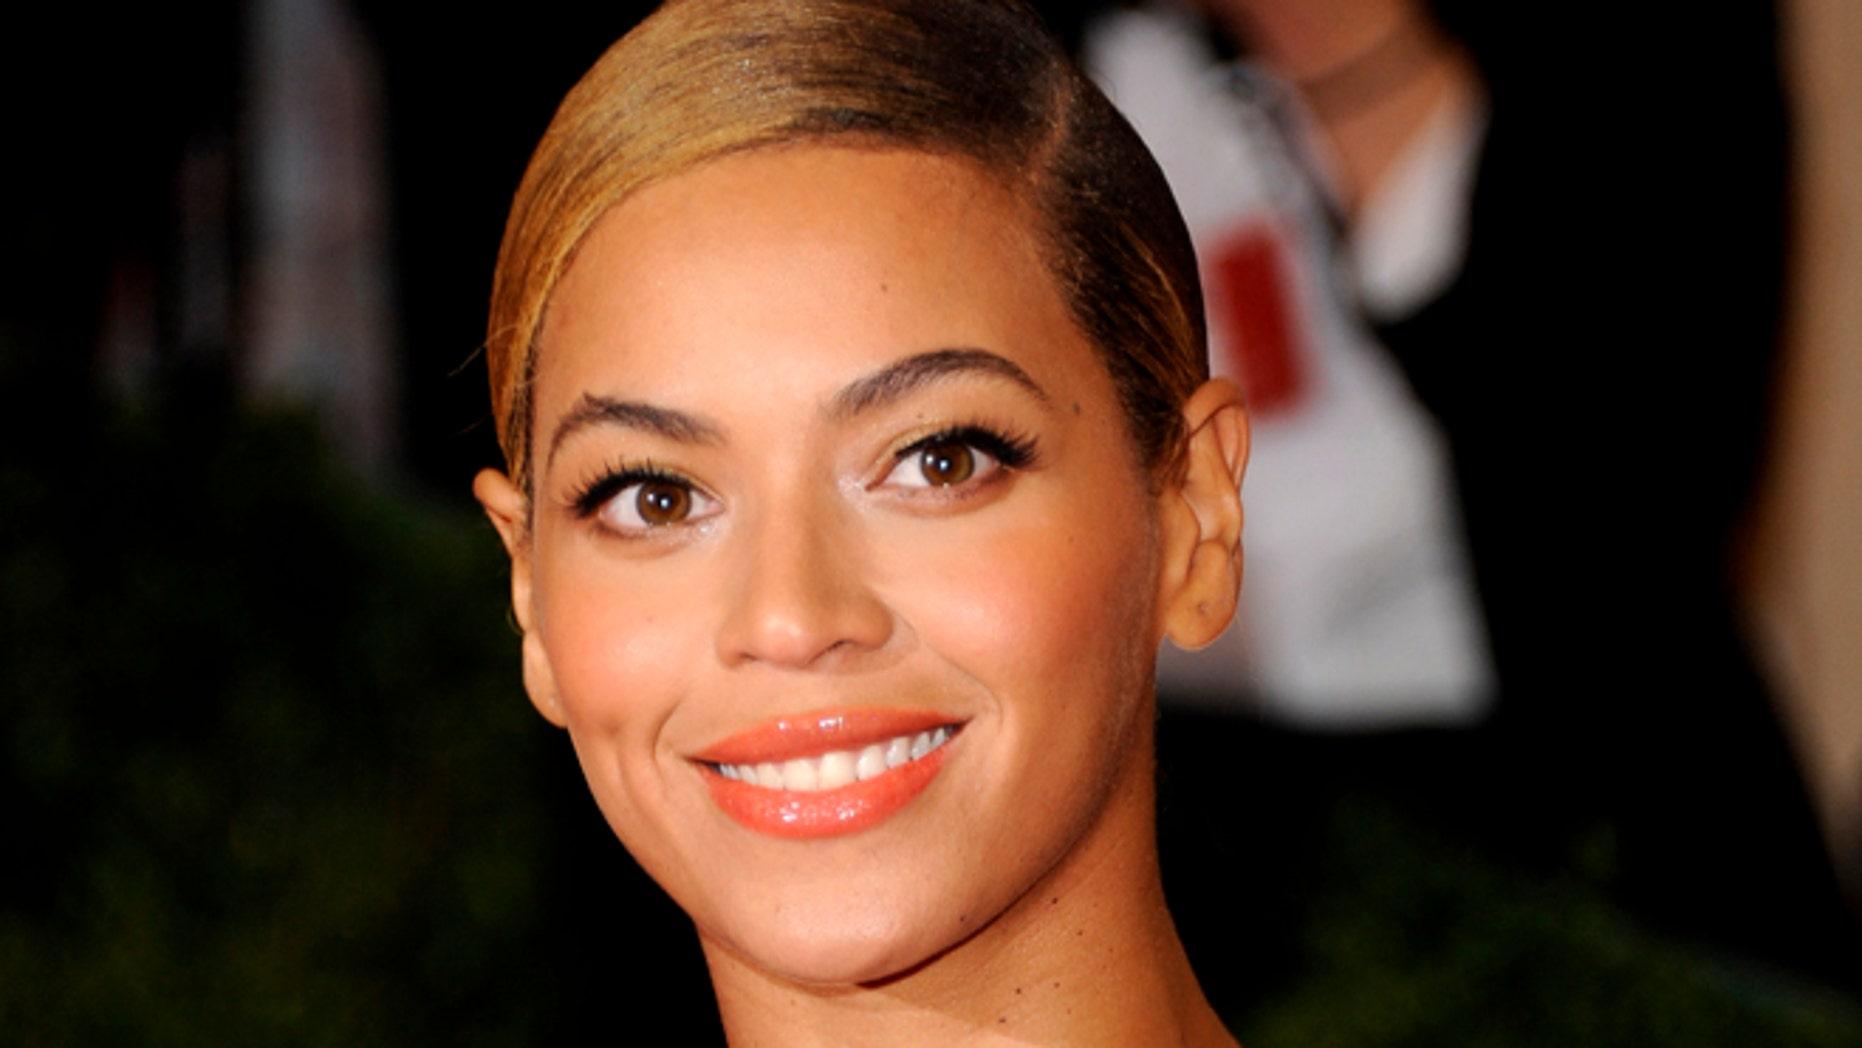 May 7, 2012: This file photo shows Beyonce Knowles at the Metropolitan Museum of Art Costume Institute gala benefit, celebrating Elsa Schiaparelli and Miuccia Prada in New York.